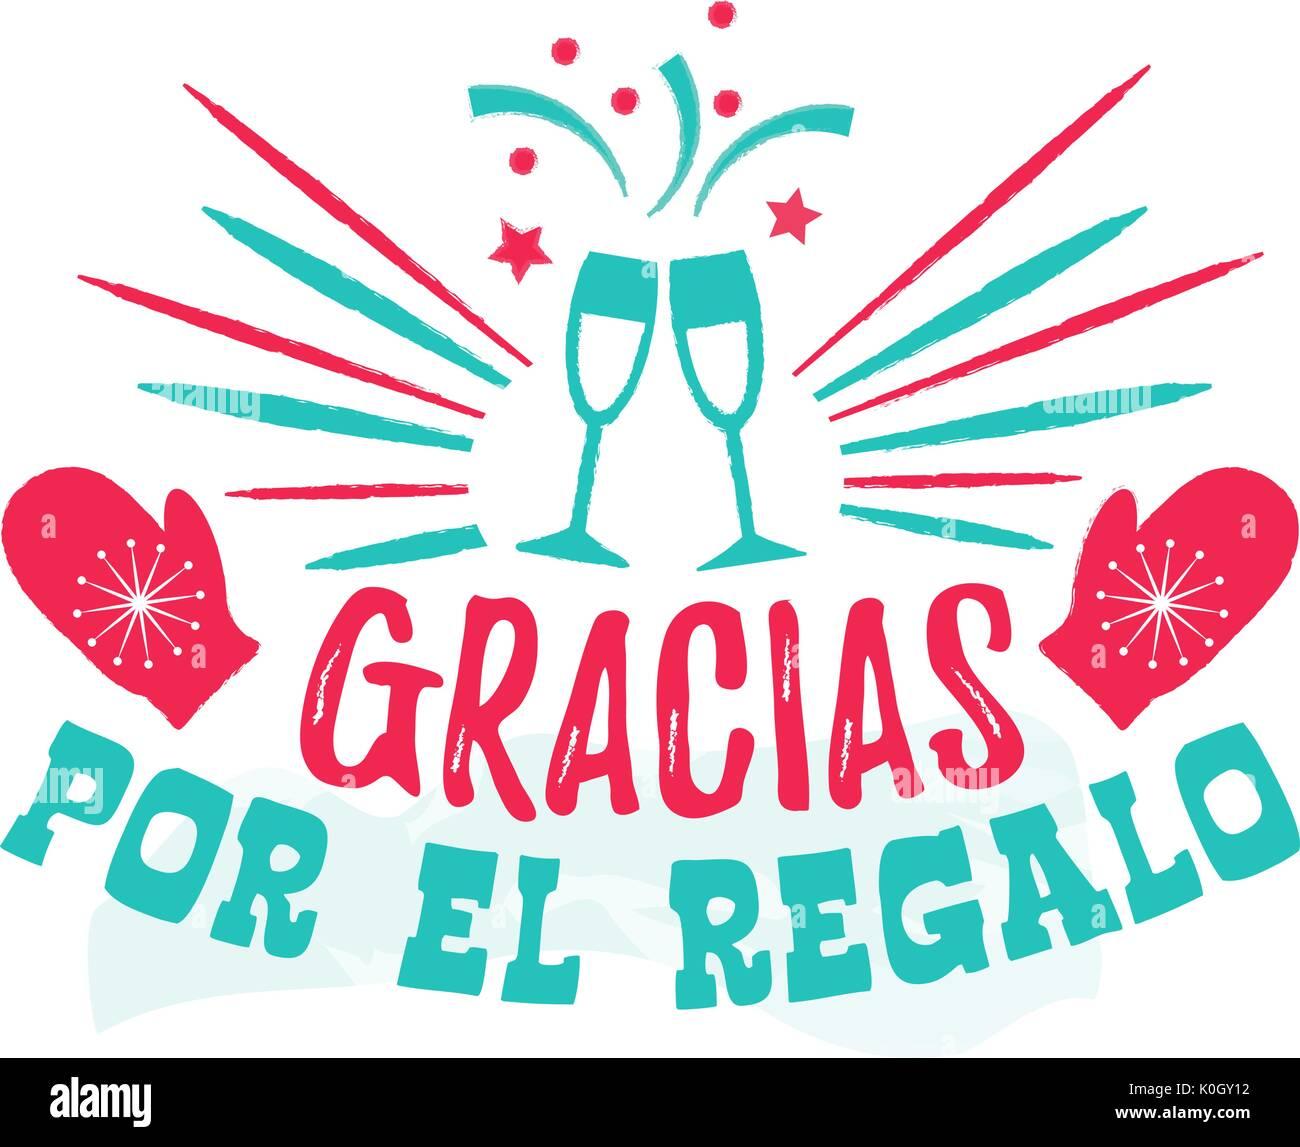 Spanish greeting card stock photos spanish greeting card stock thank you for the gift spanish language stock image kristyandbryce Choice Image